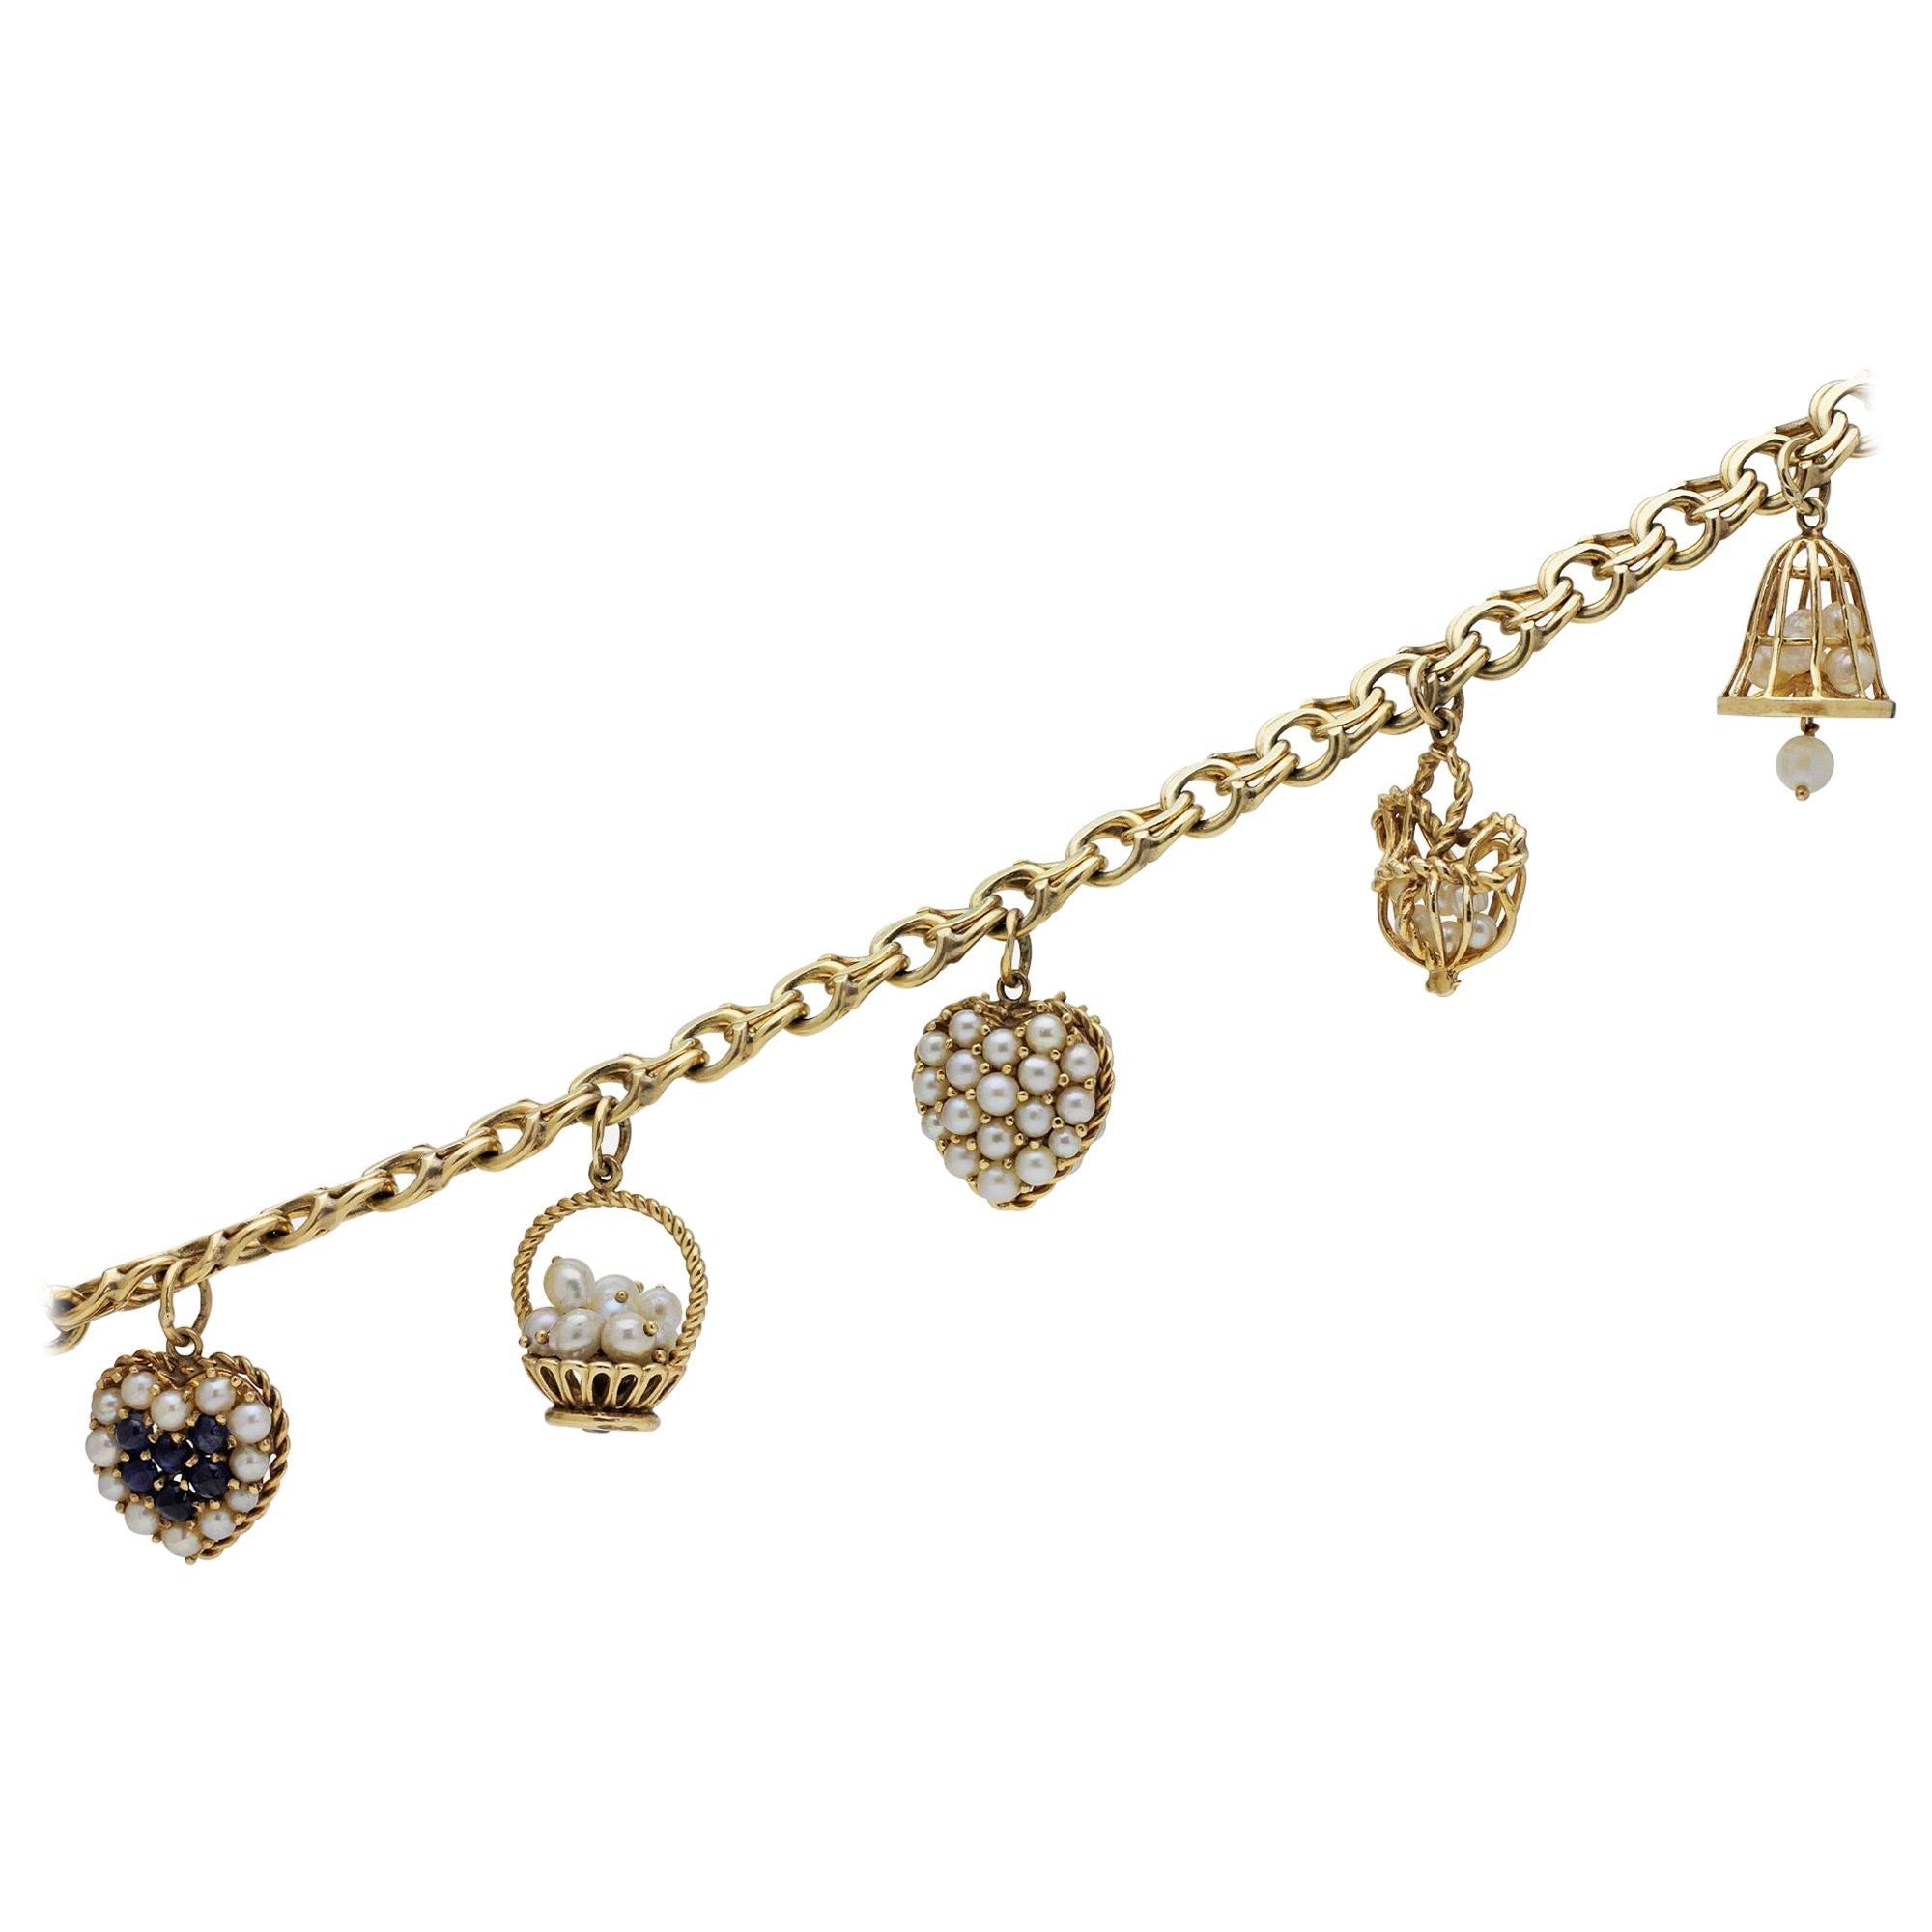 14 Karat Yellow Gold Charm Bracelet with Pearls and Ceylon Sapphires